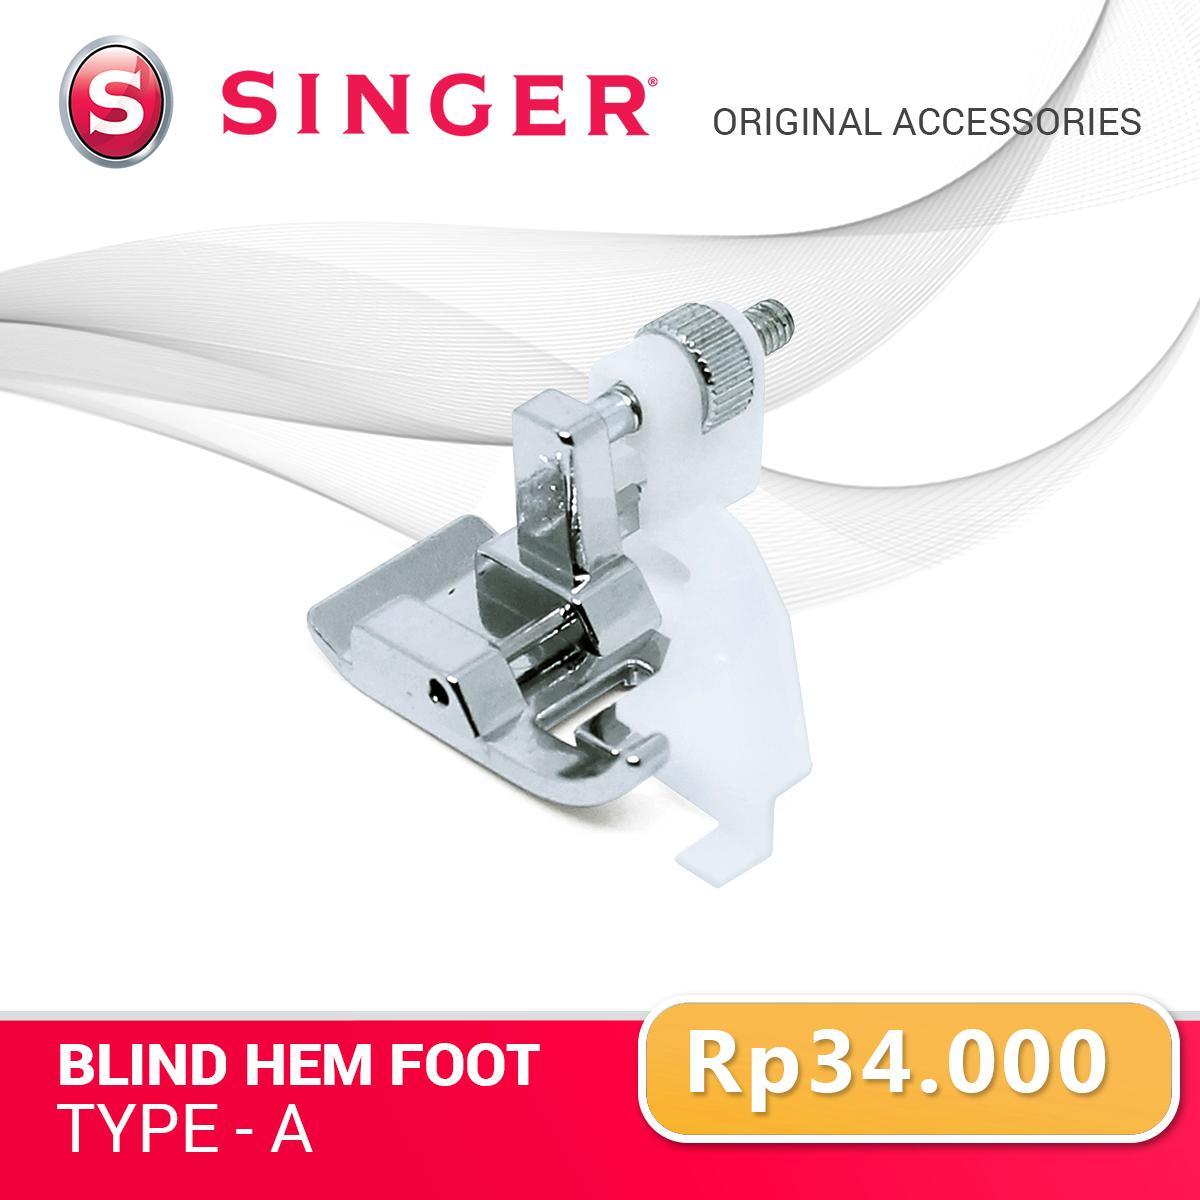 SINGER Blind Hem Foot Type A - sepatu mesin jahit portable